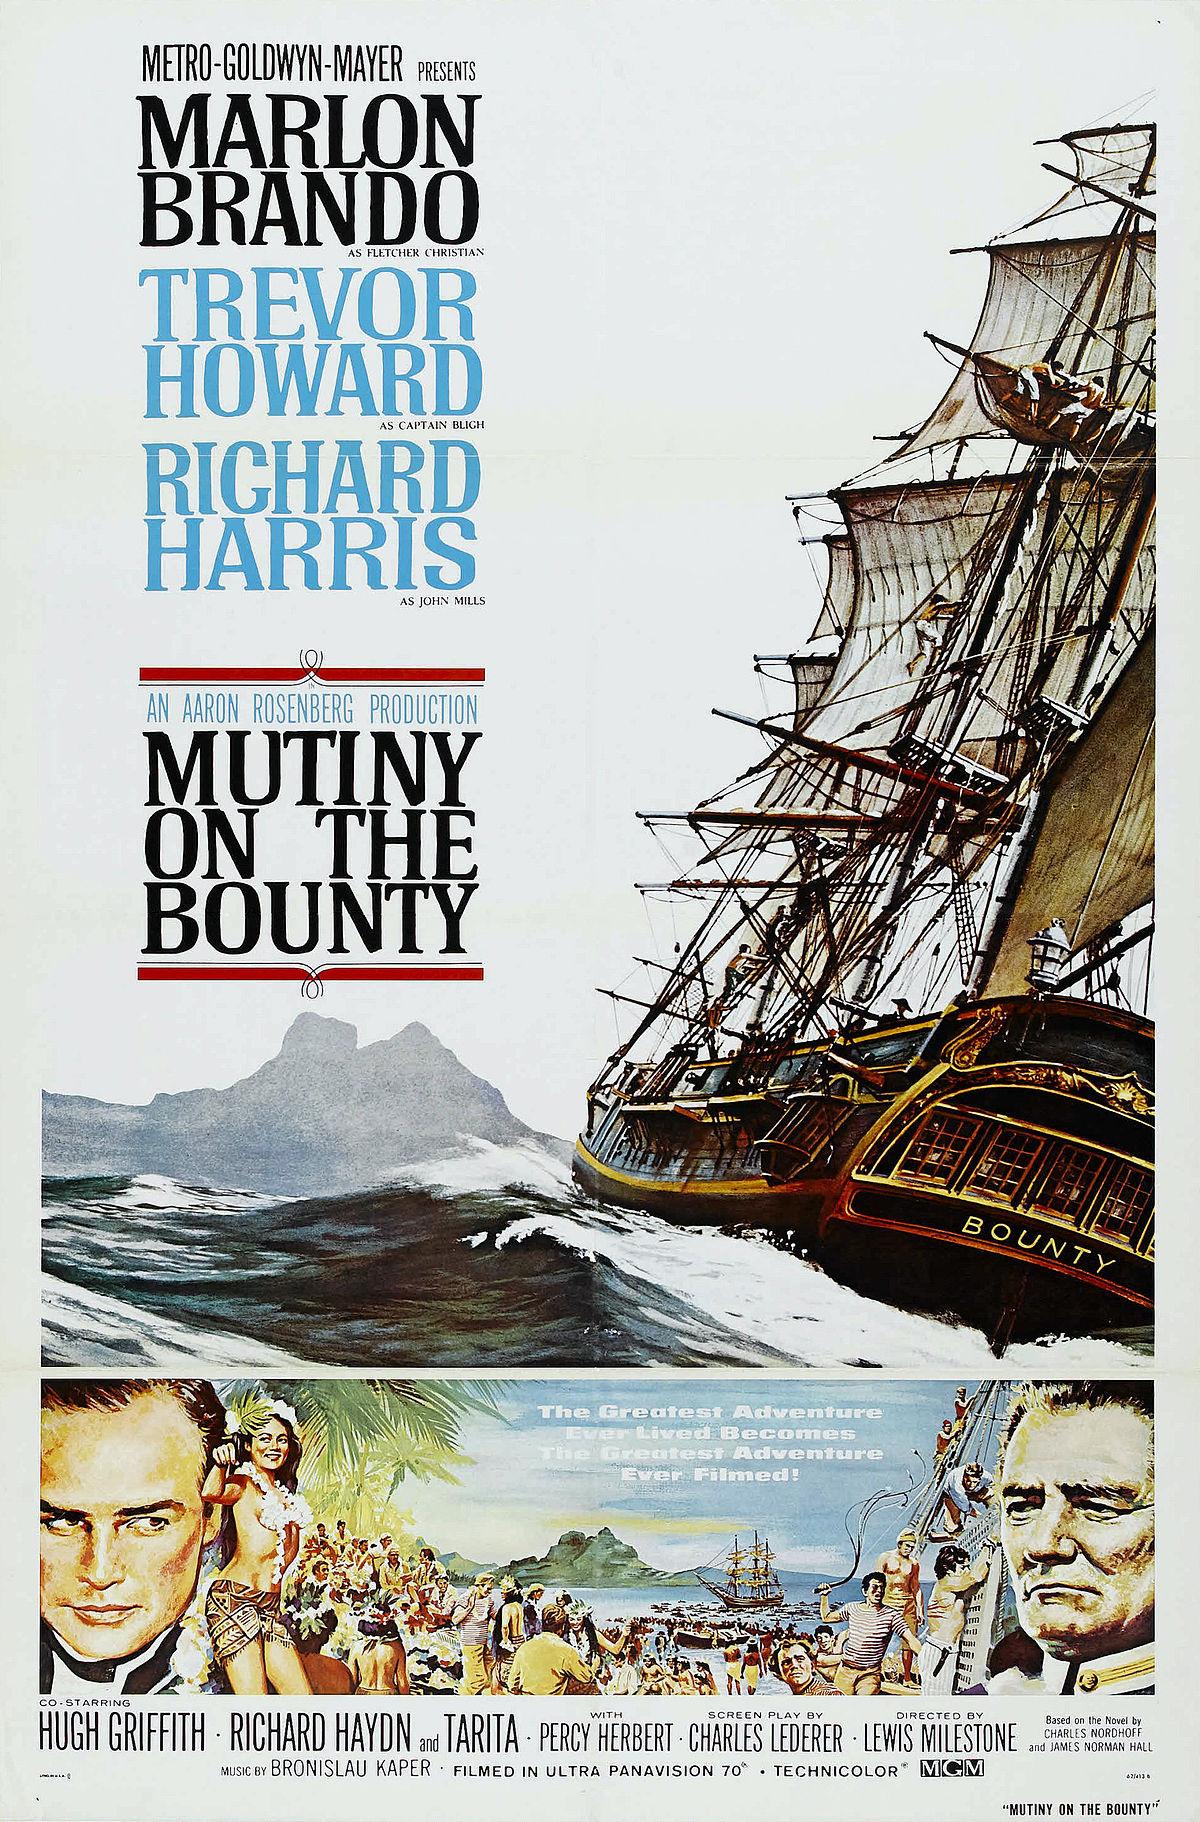 Mutiny on the Bounty (1962 film) - Wikipedia